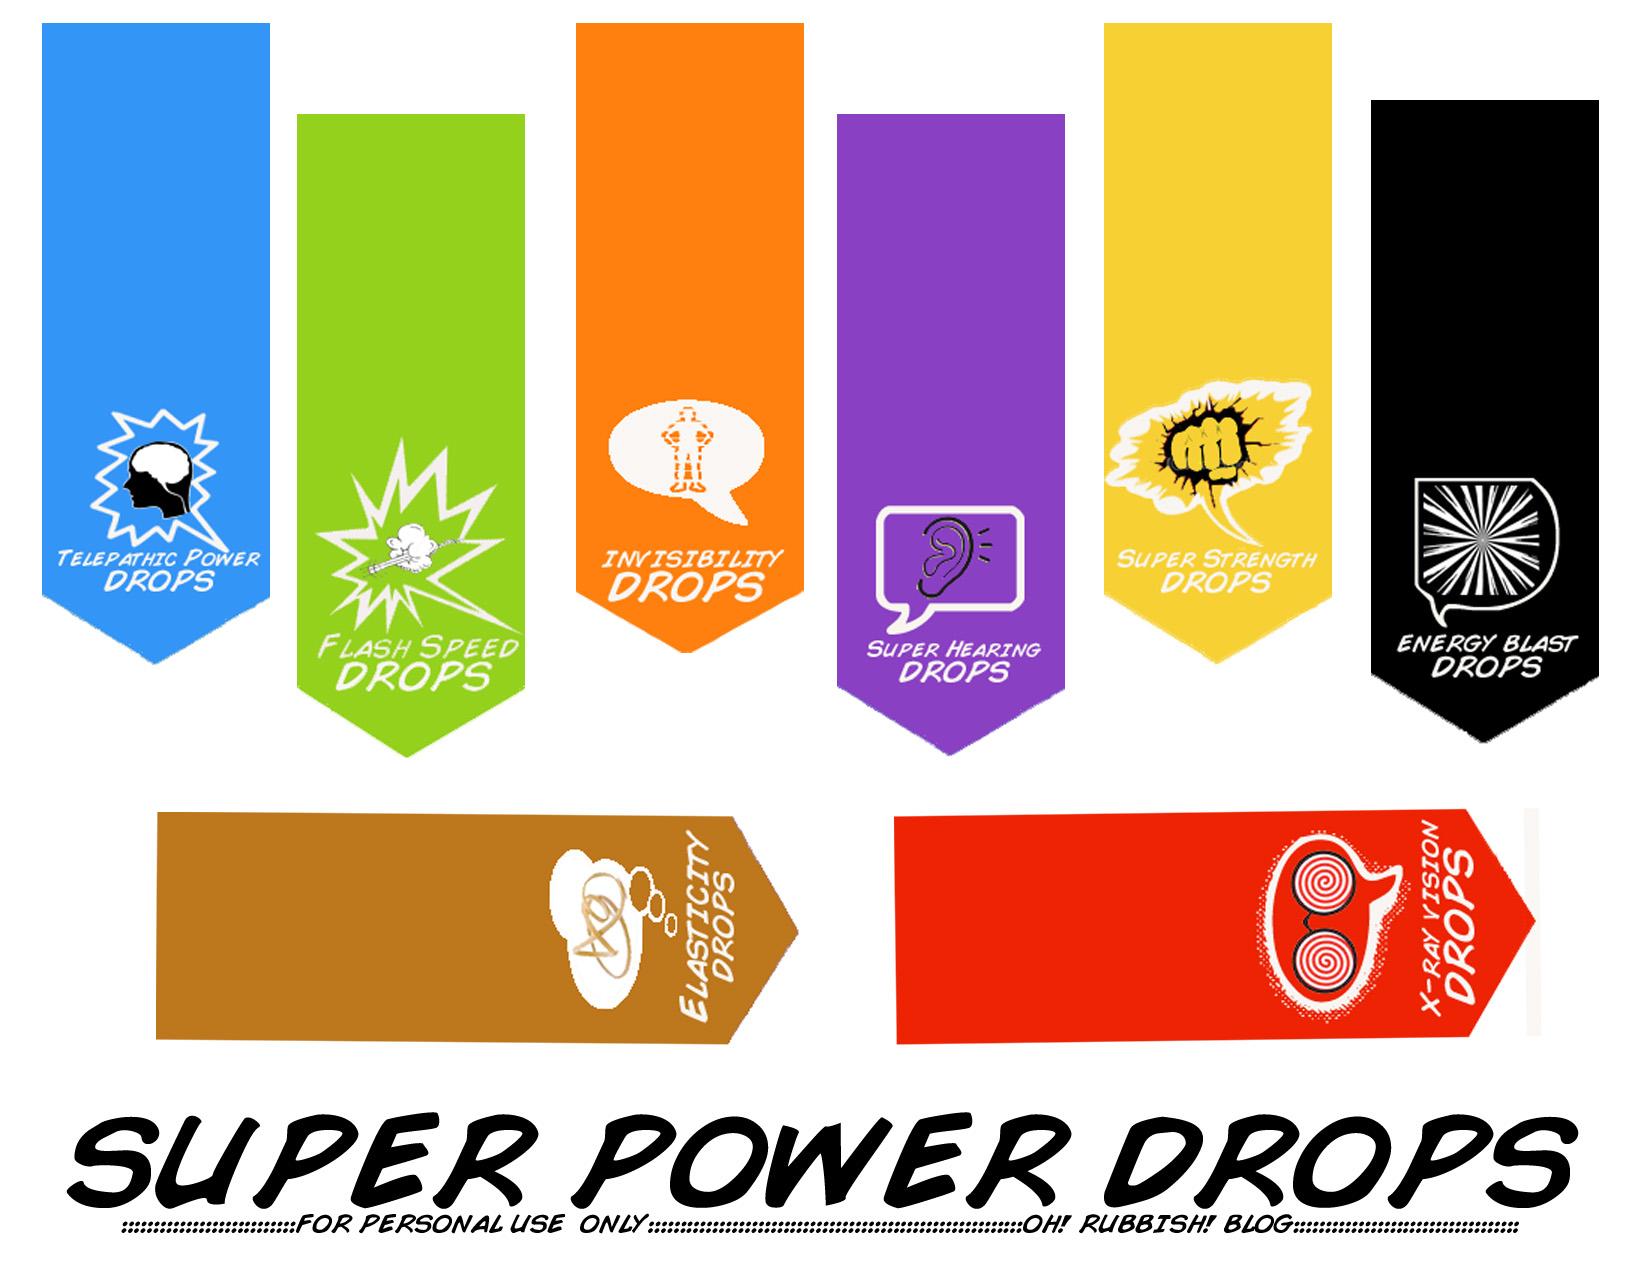 SUPER POWER DROPS Printable oh rubbish blog